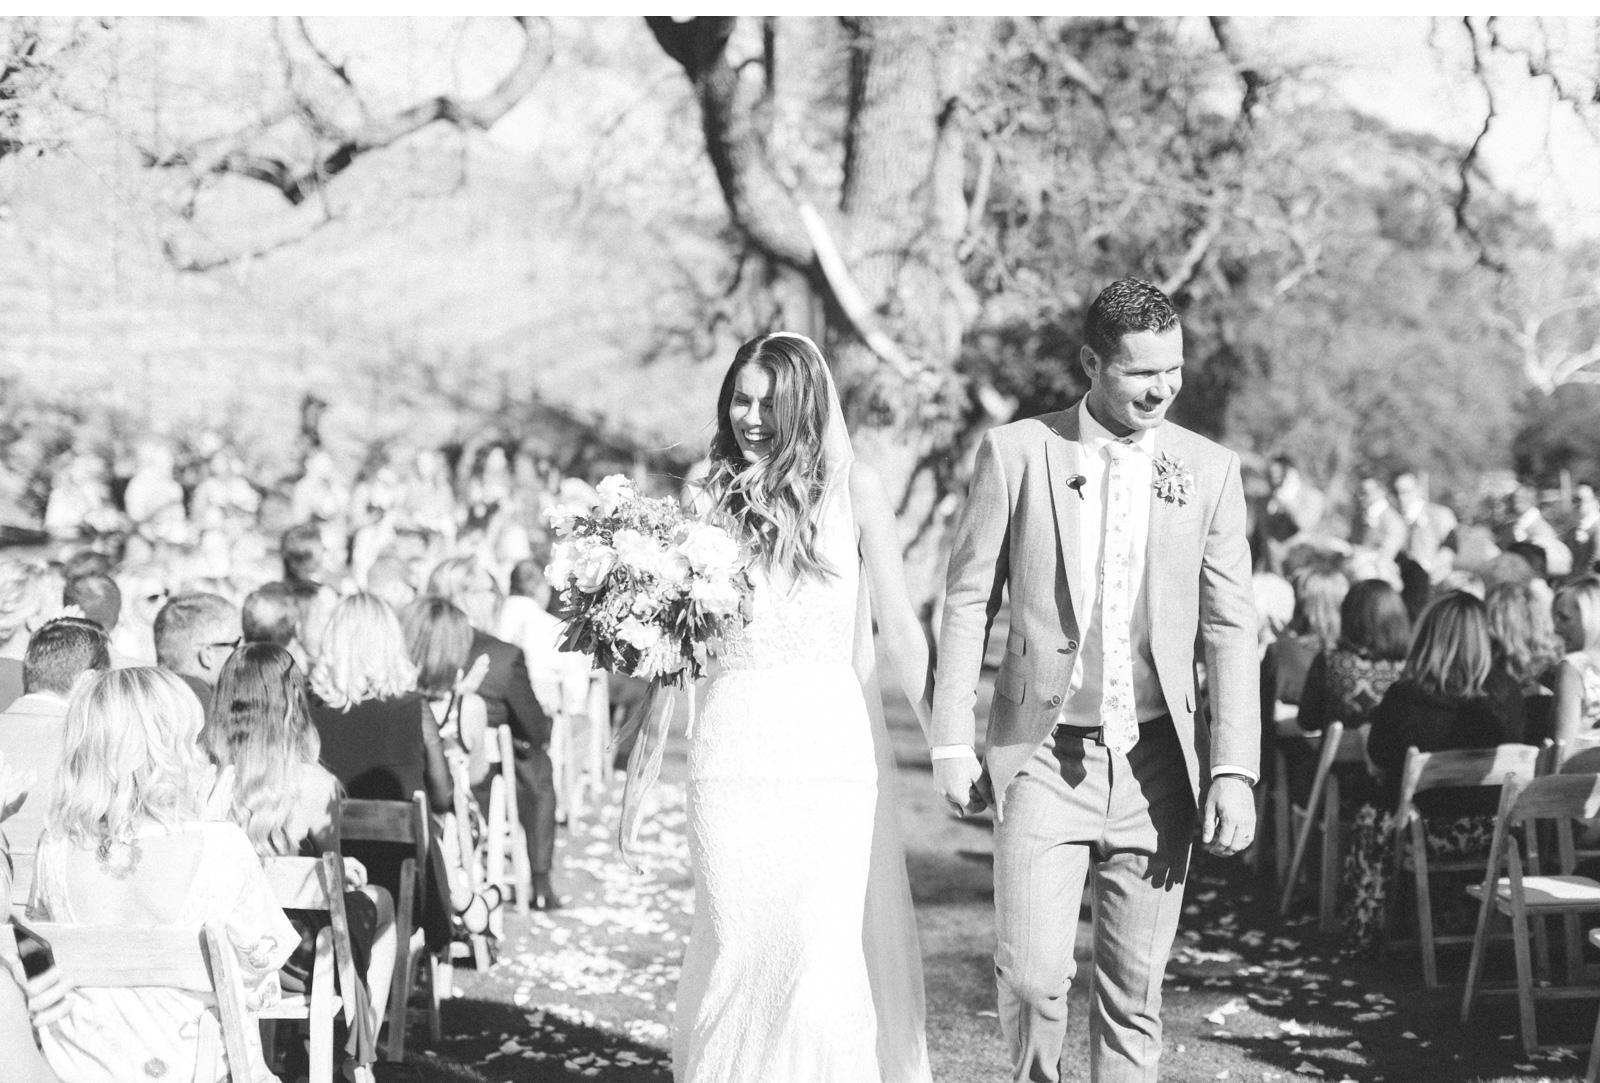 Malibu-Wedding-Photographer-Triunfo-Creek-Natalie-Schutt-Photography_08.jpg